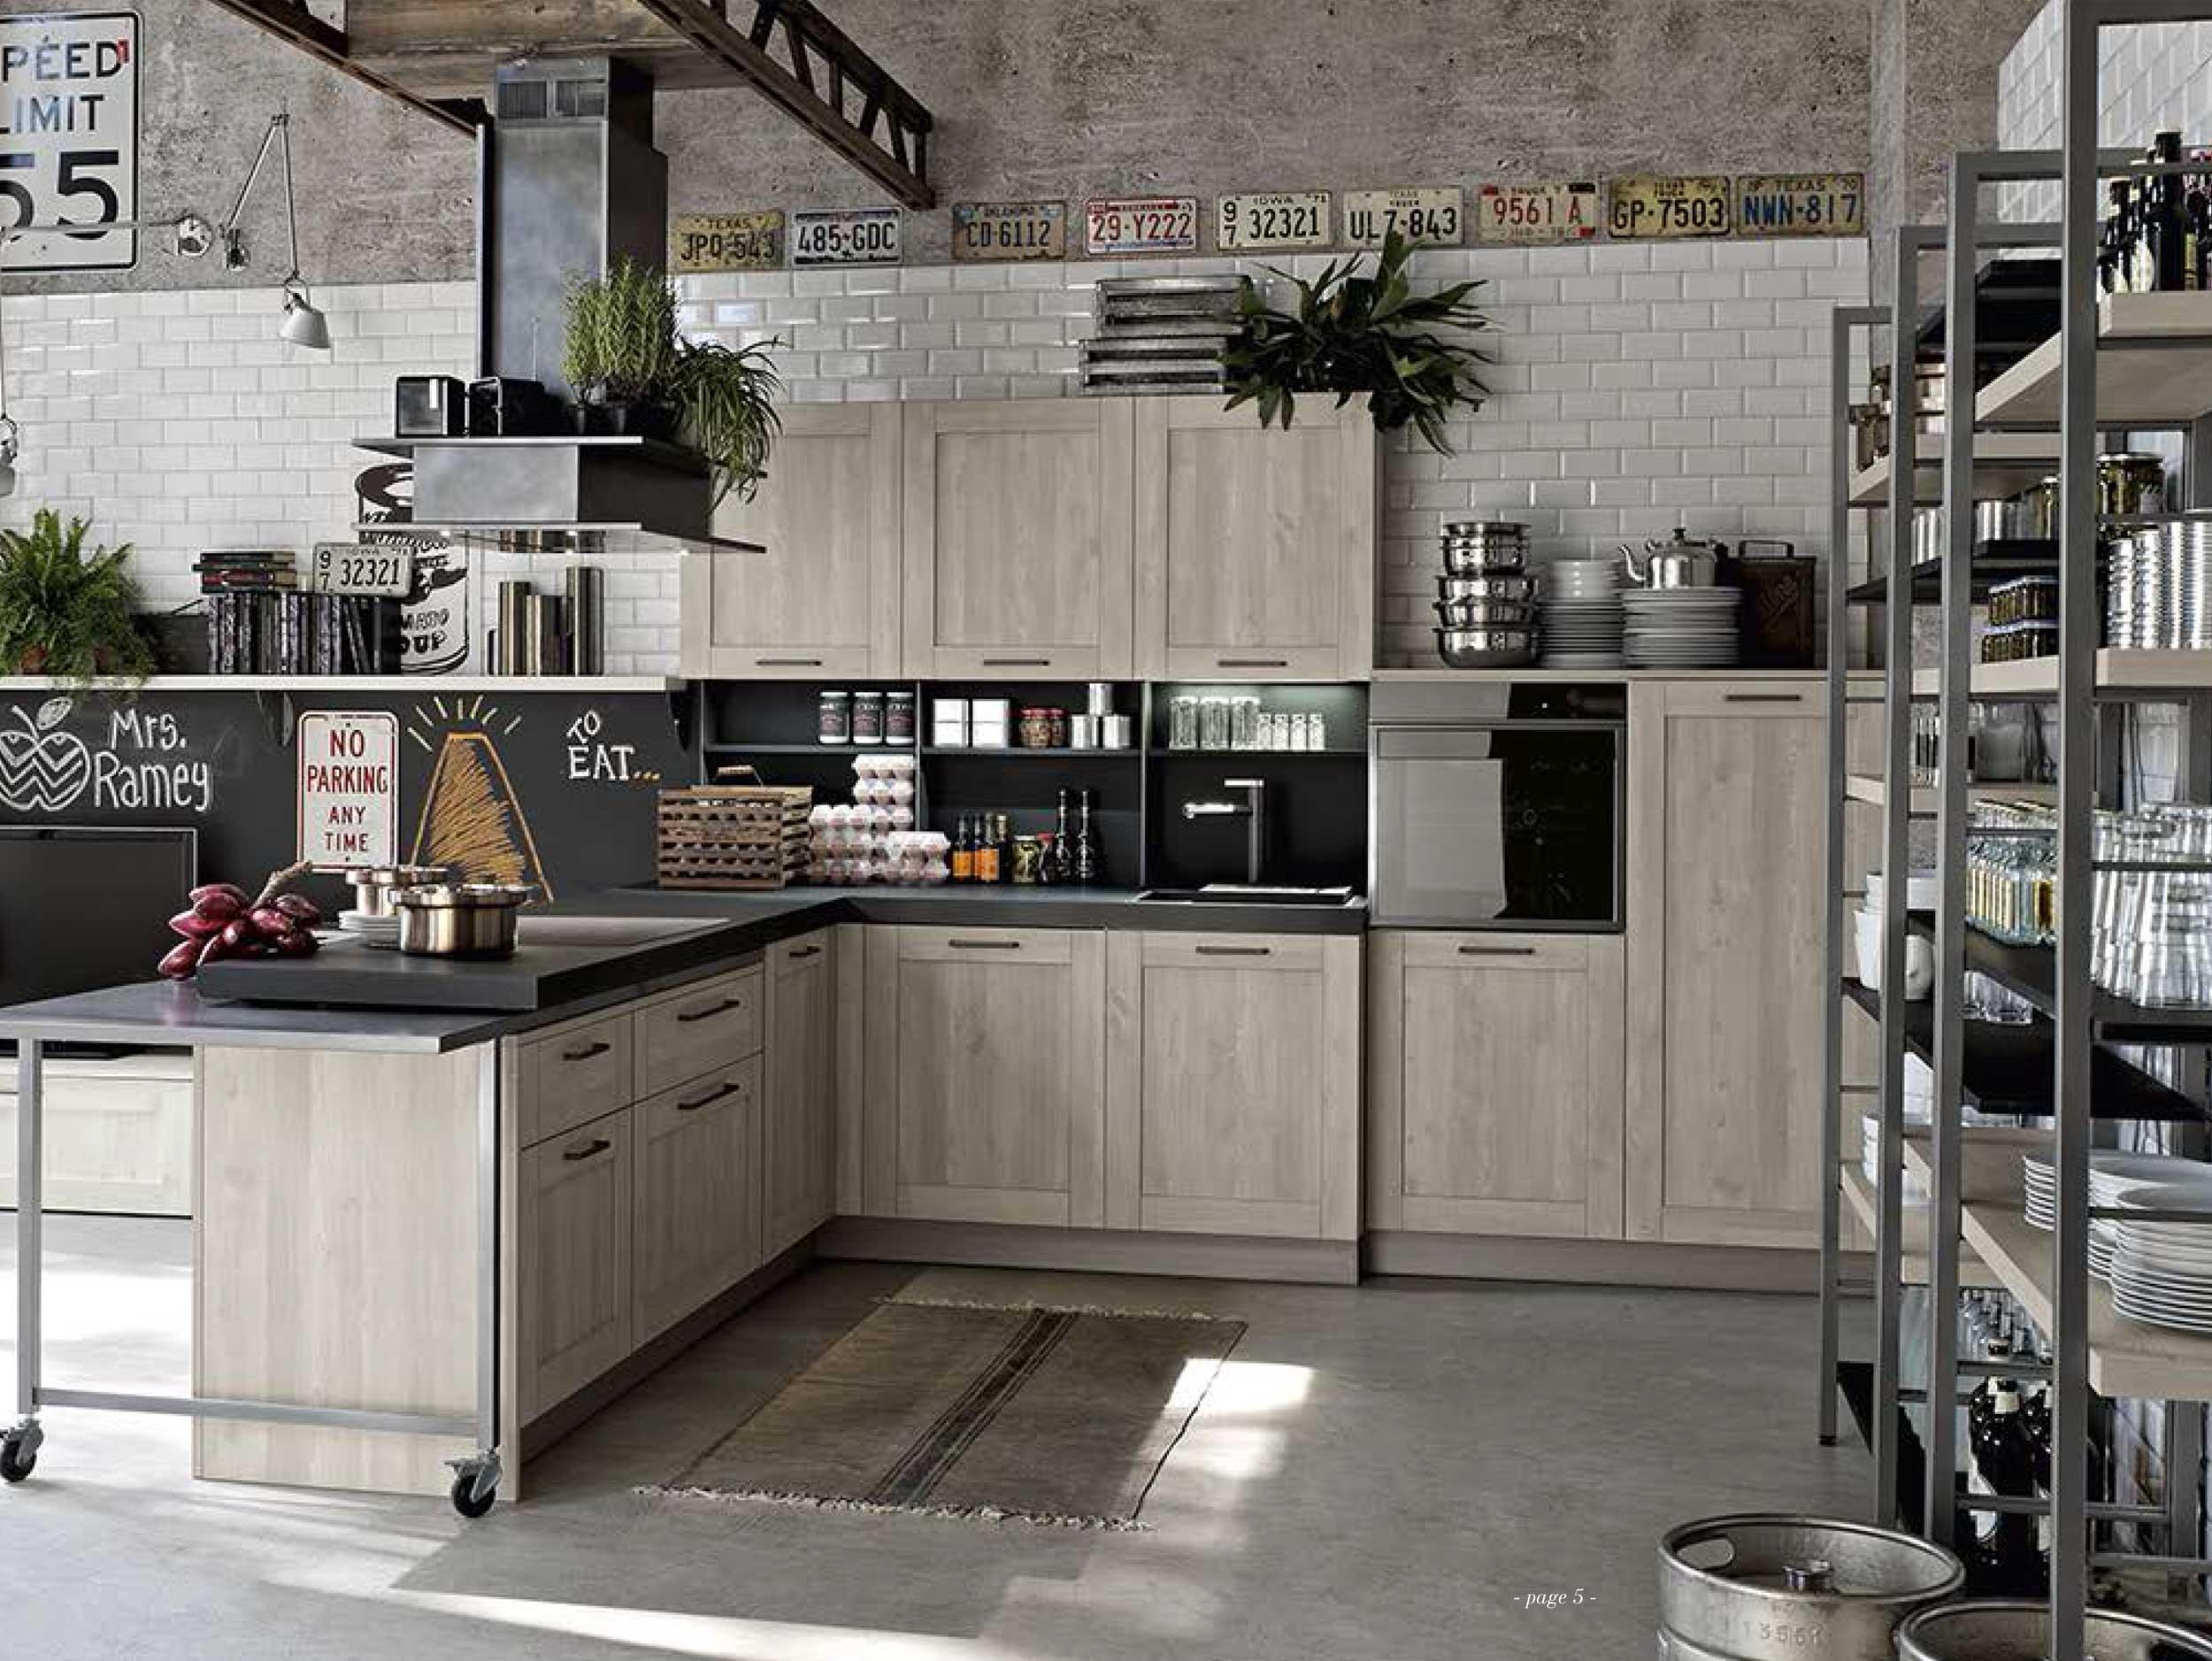 Cucina city stosa cucine ravenna for Stosa cucine verona